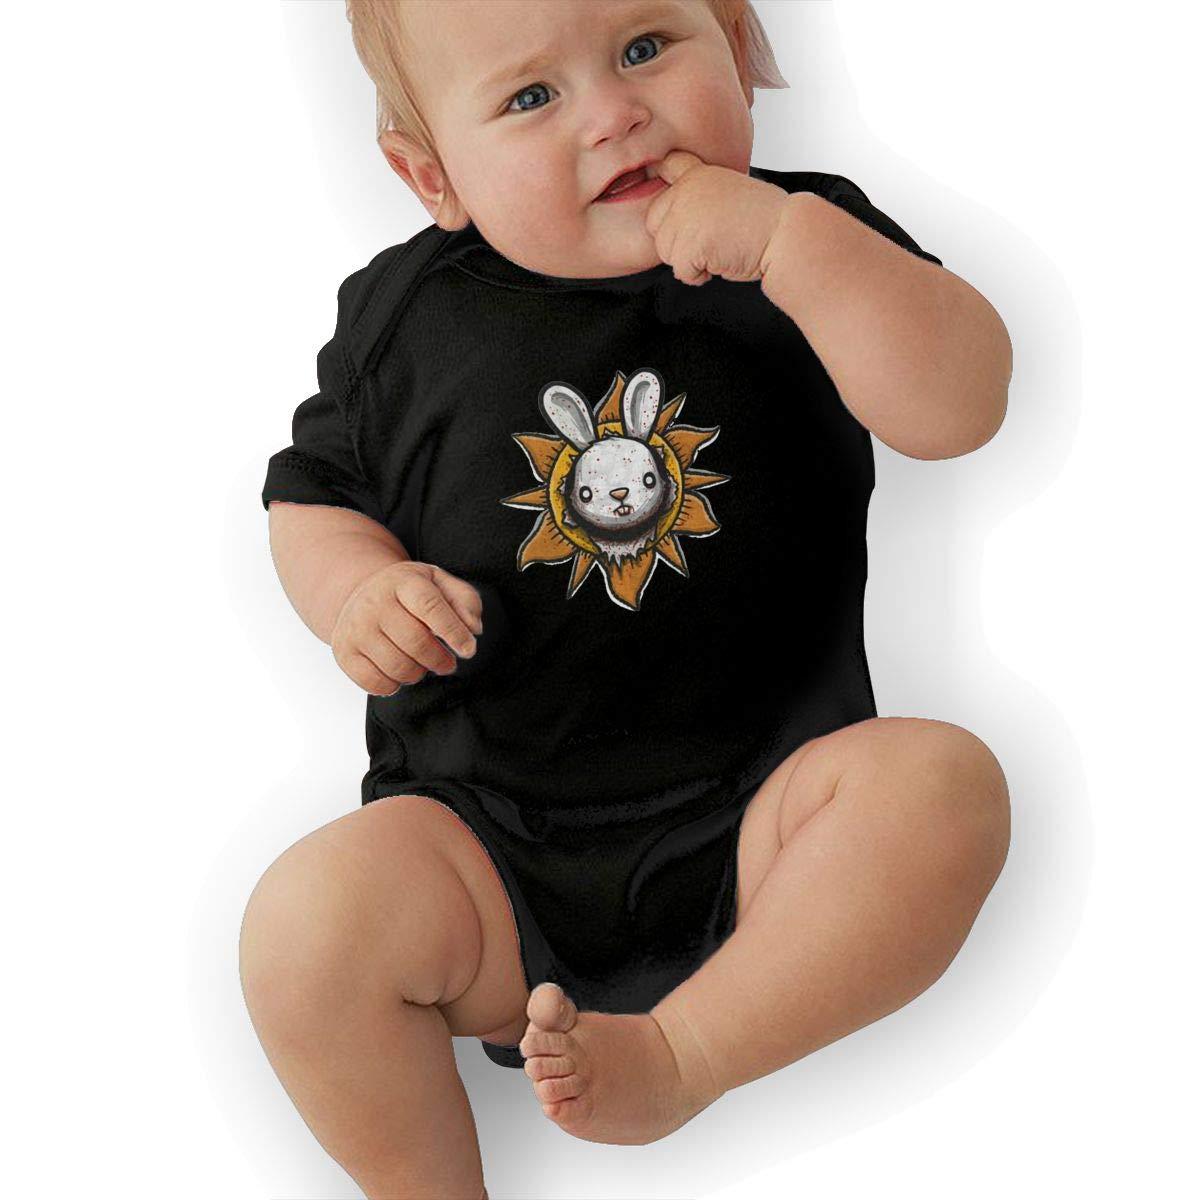 Coollifea Killer Bunny Baby Romper 0-18 Months Newborn Baby Girls Boys Layette Rompers Black